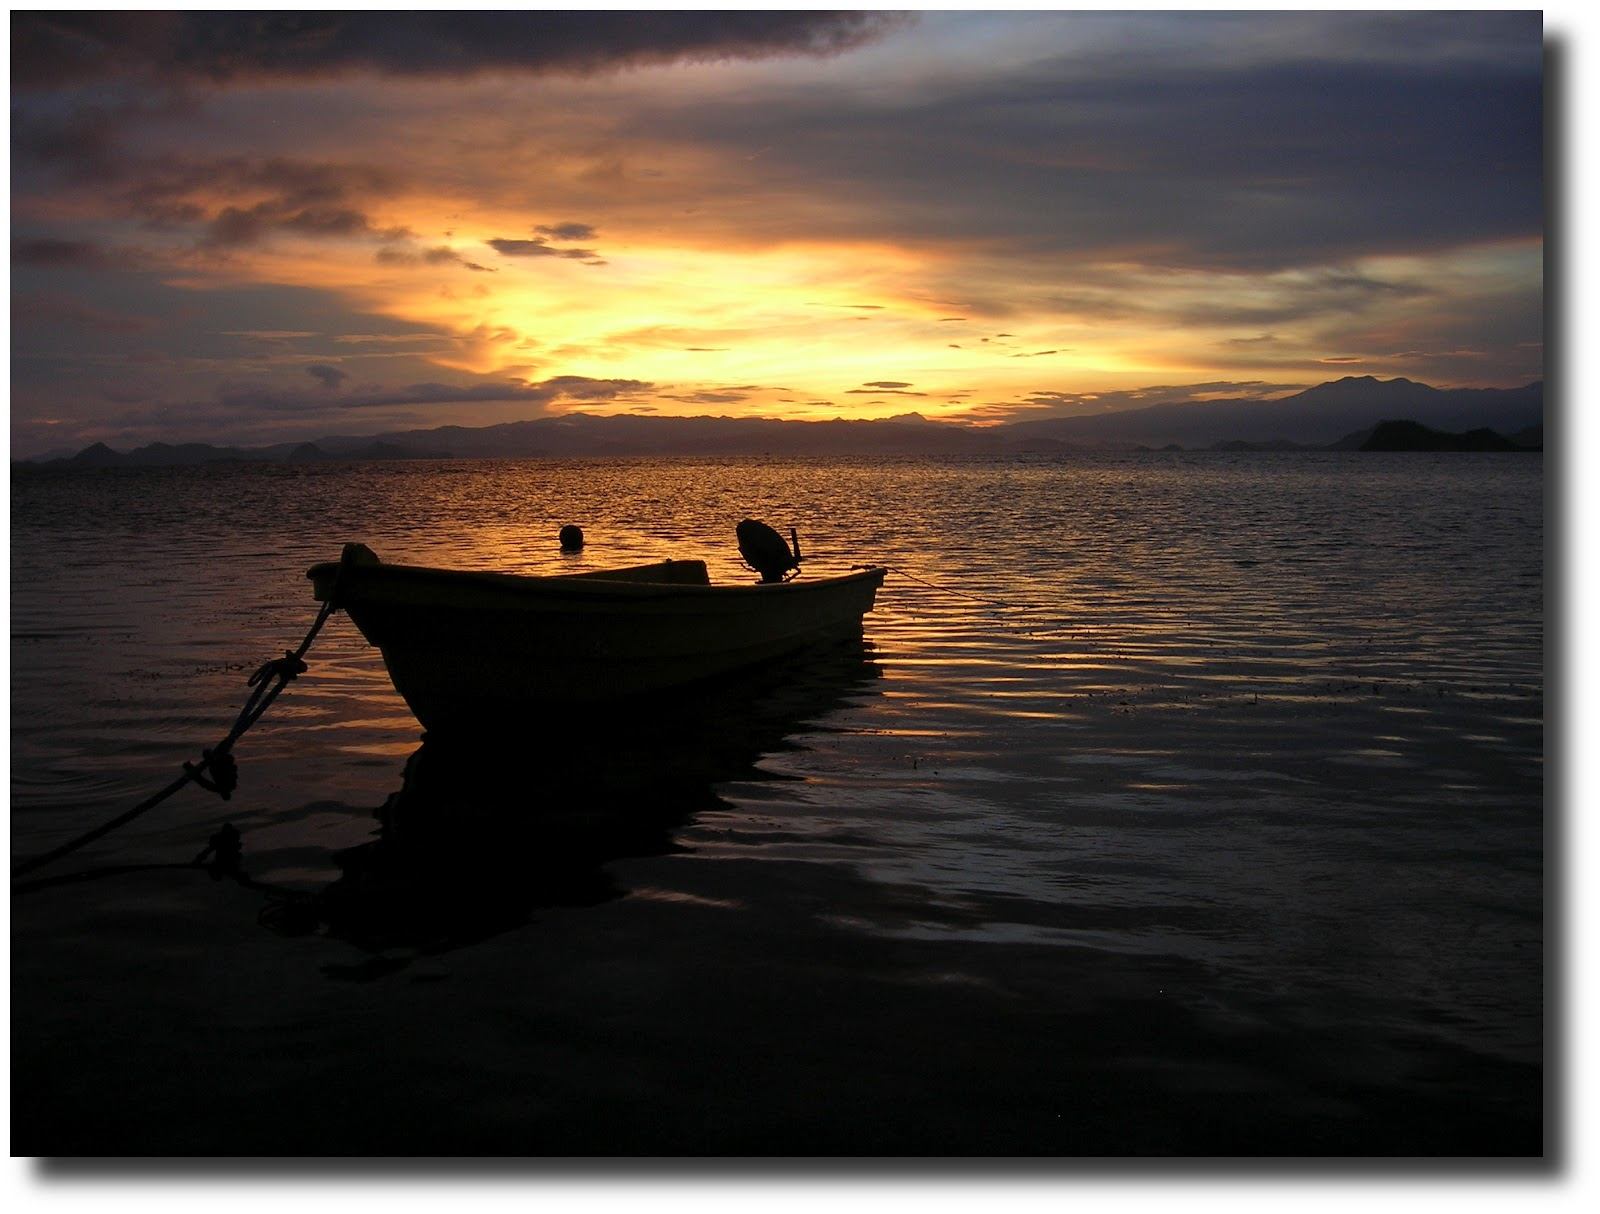 isla kanawa, isla flores, indonesia, vuelta al mundo, round the world, La vuelta al mundo de Asun y Ricardo, mundoporlibre.com